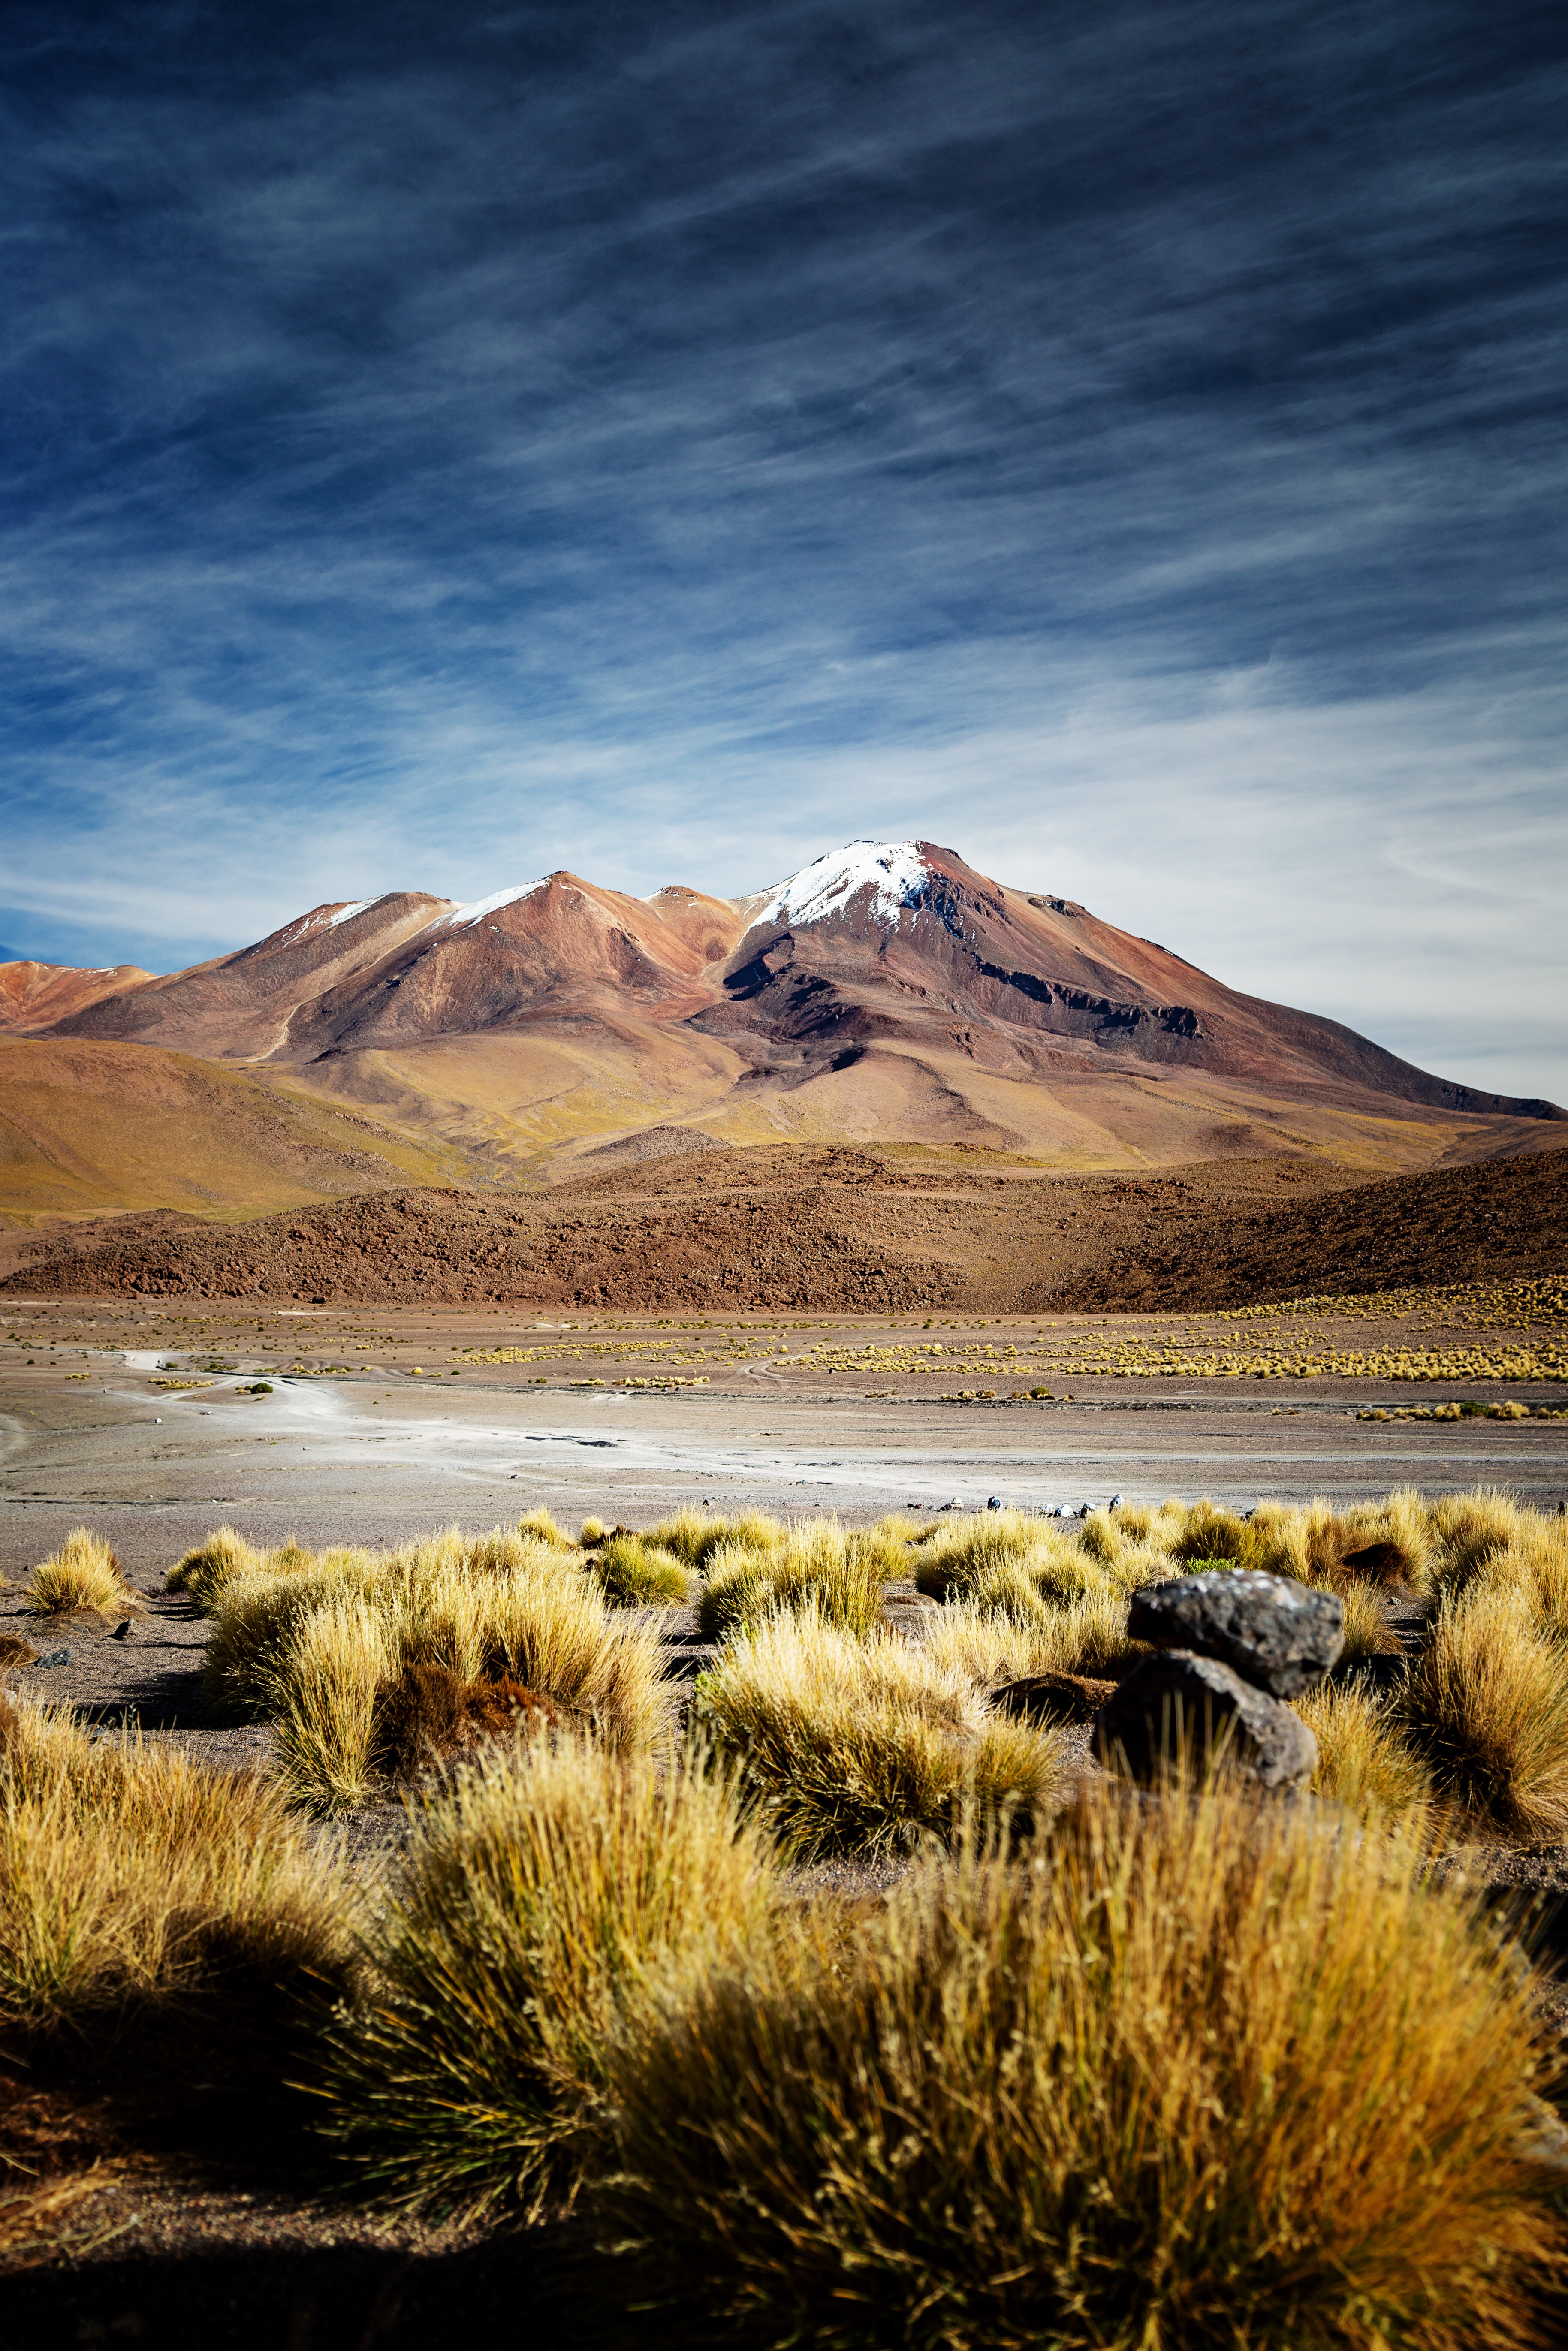 Altiplano Blick zum Vulkan